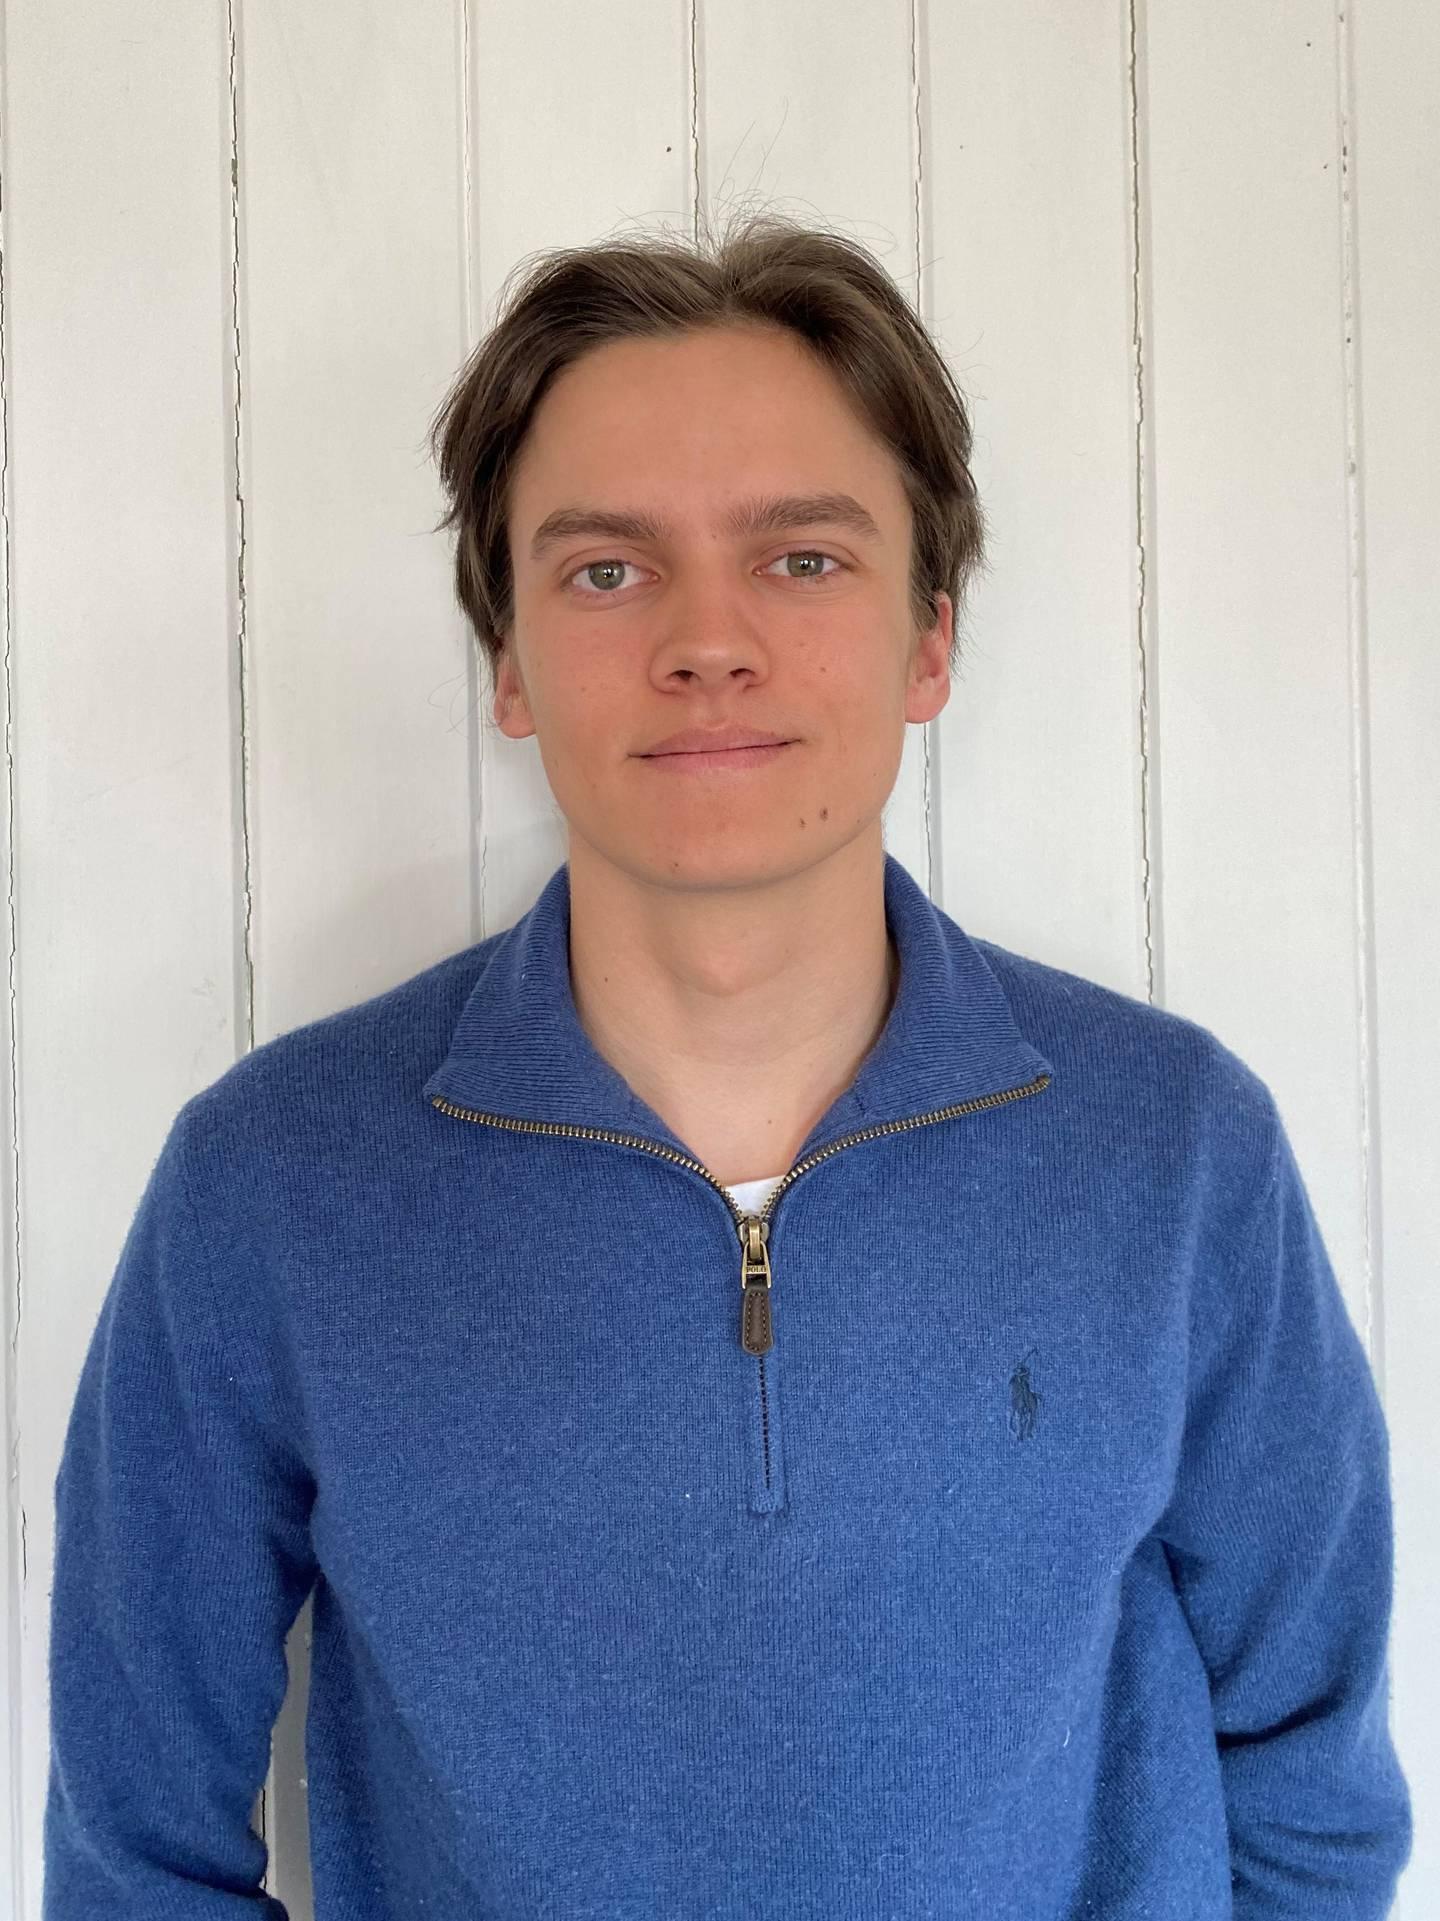 Leder av Fredrikstad ungdomsråd, Emil Røgeberg.